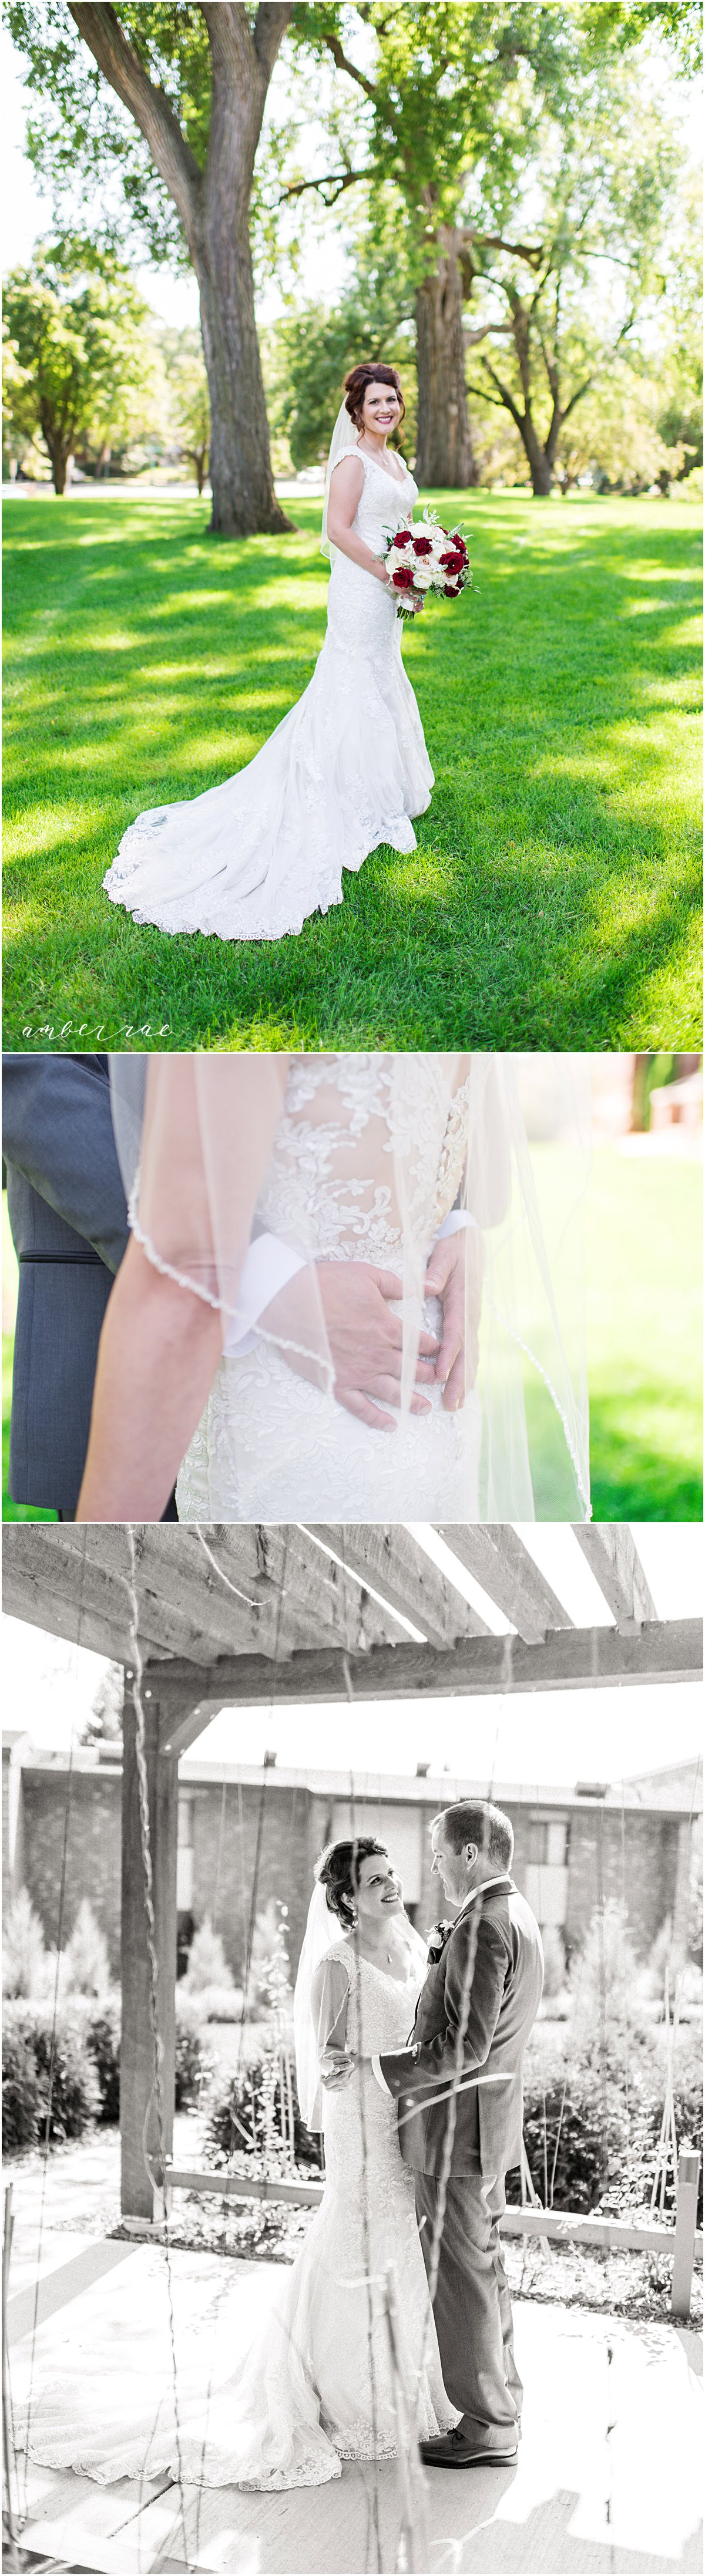 Gustafson Wedding 2018_0007.jpg